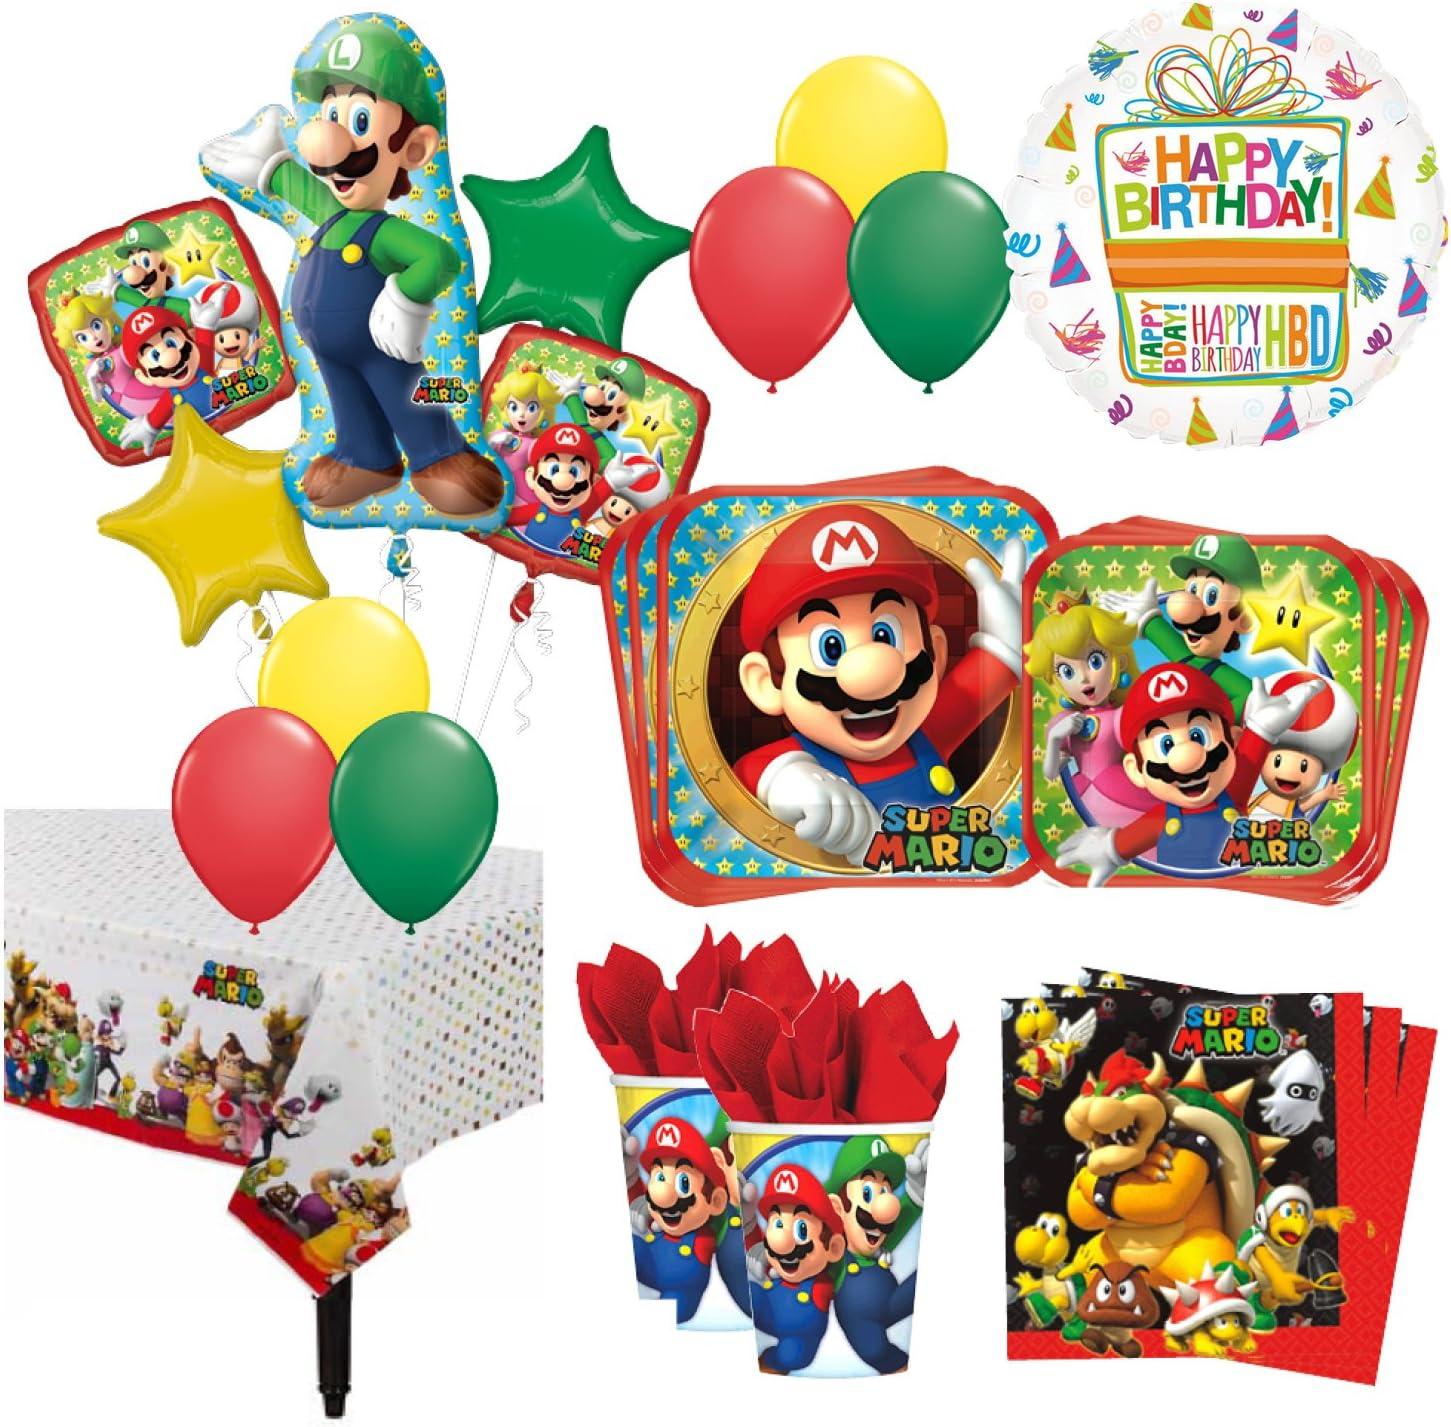 Super MARIO KART Tableware Balloons /& Decorations Birthday PARTY RANGE